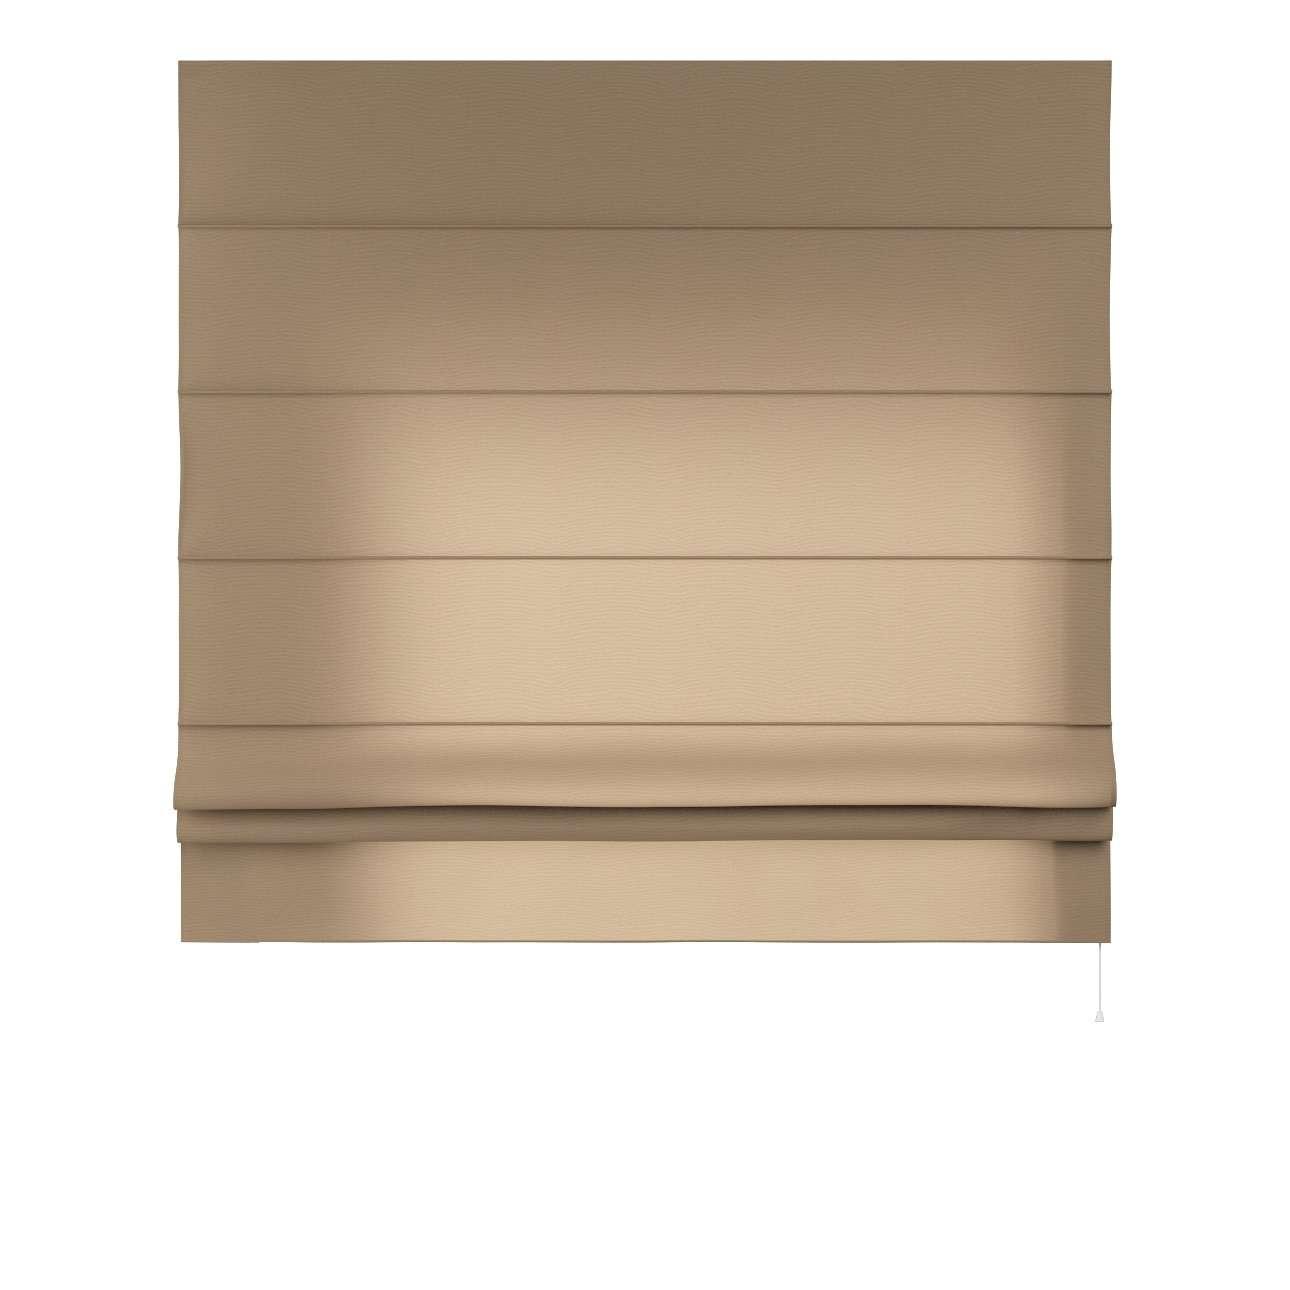 Raffrollo Padva 80 x 170 cm von der Kollektion Quadro, Stoff: 136-09